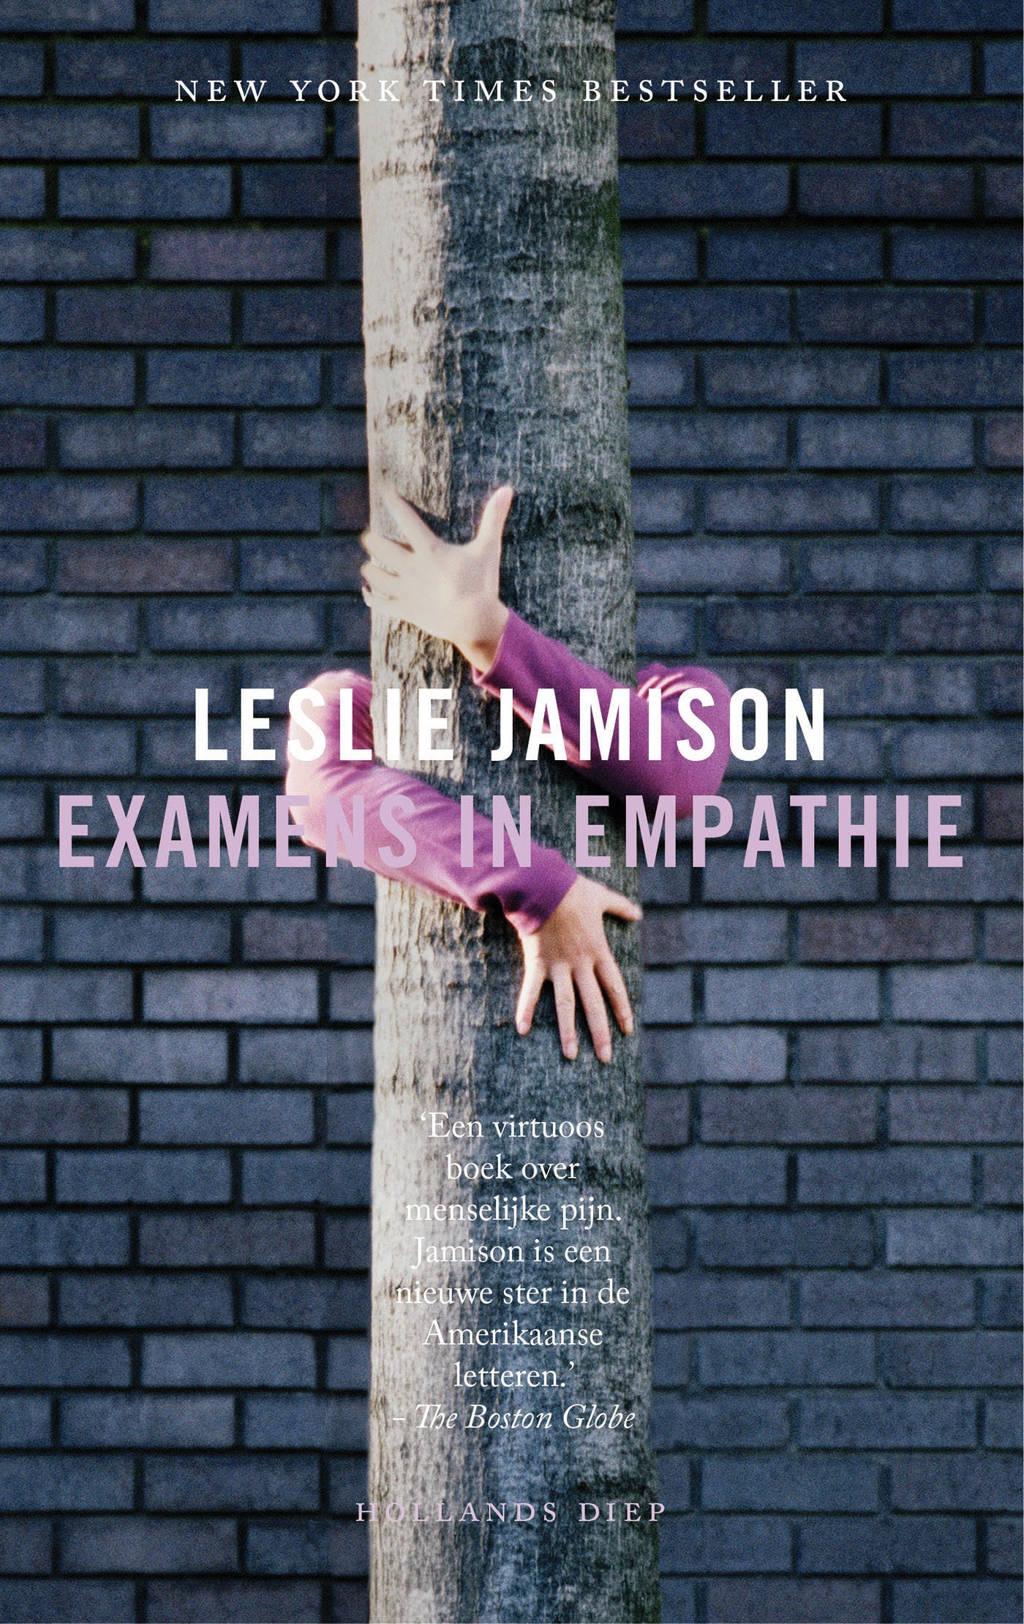 Examens in empathie - Leslie Jamison